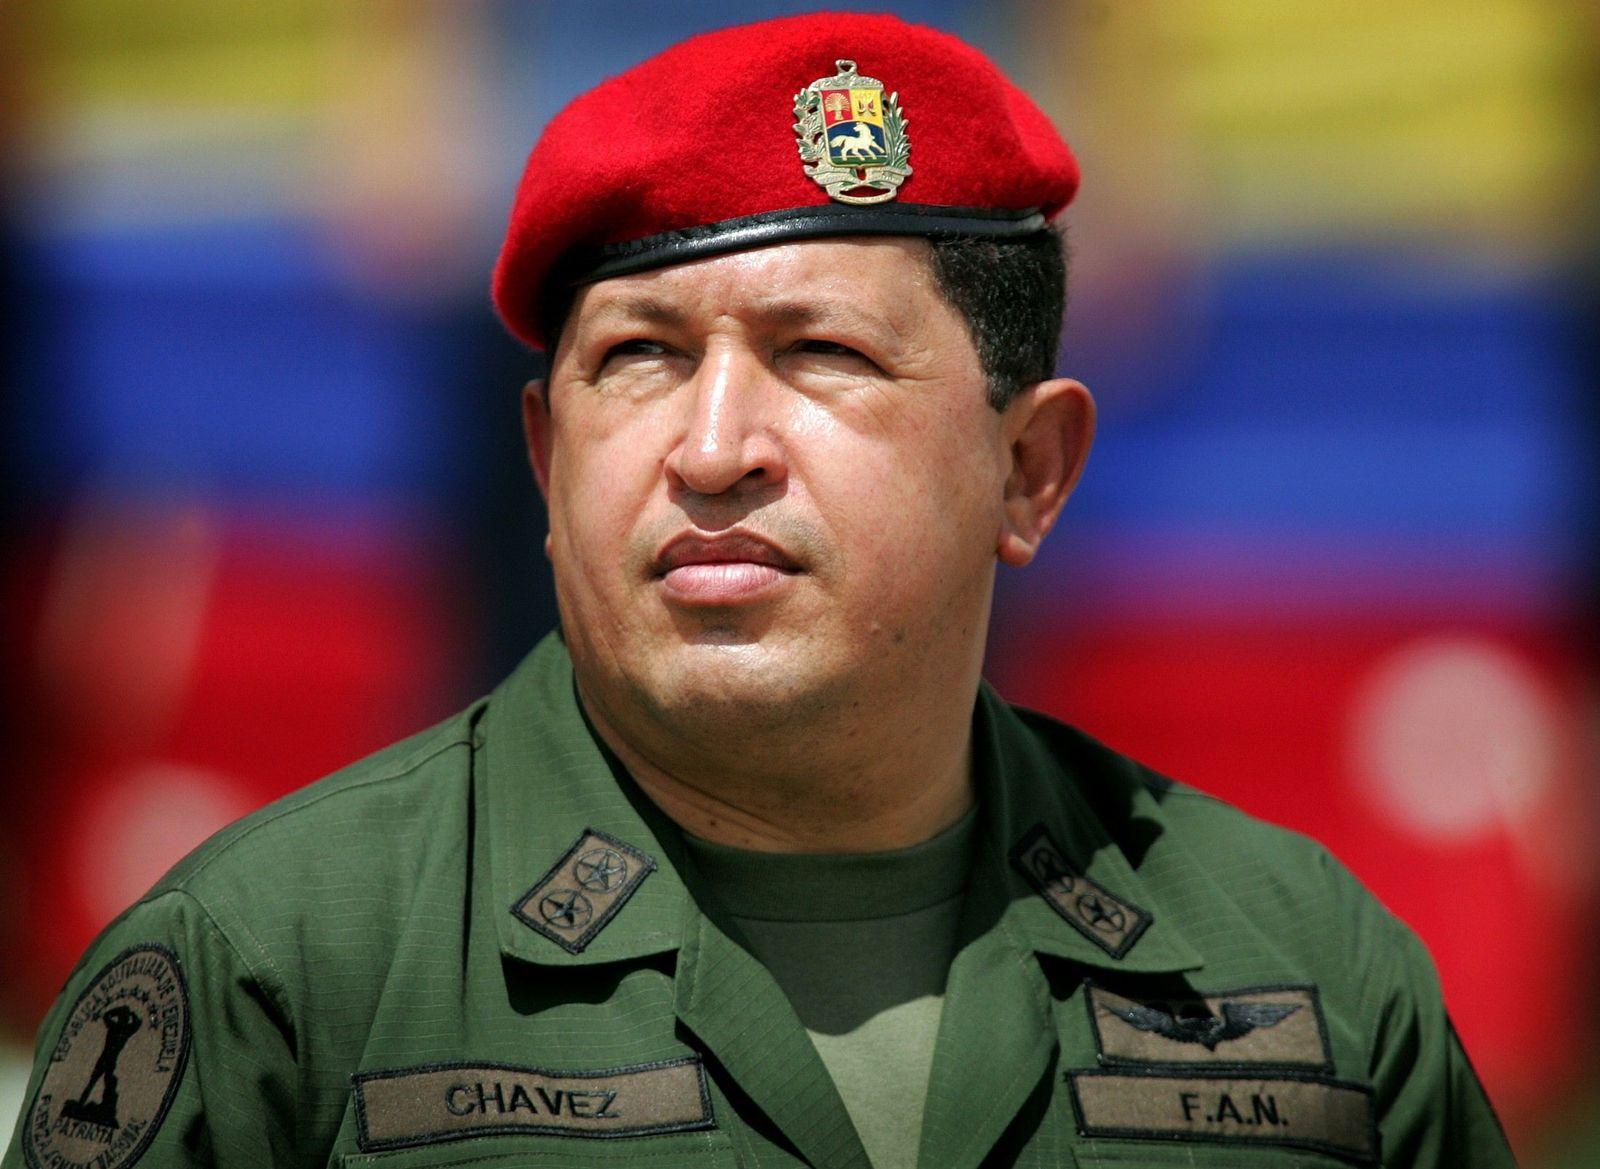 Hugo Chavez / Odebrecht